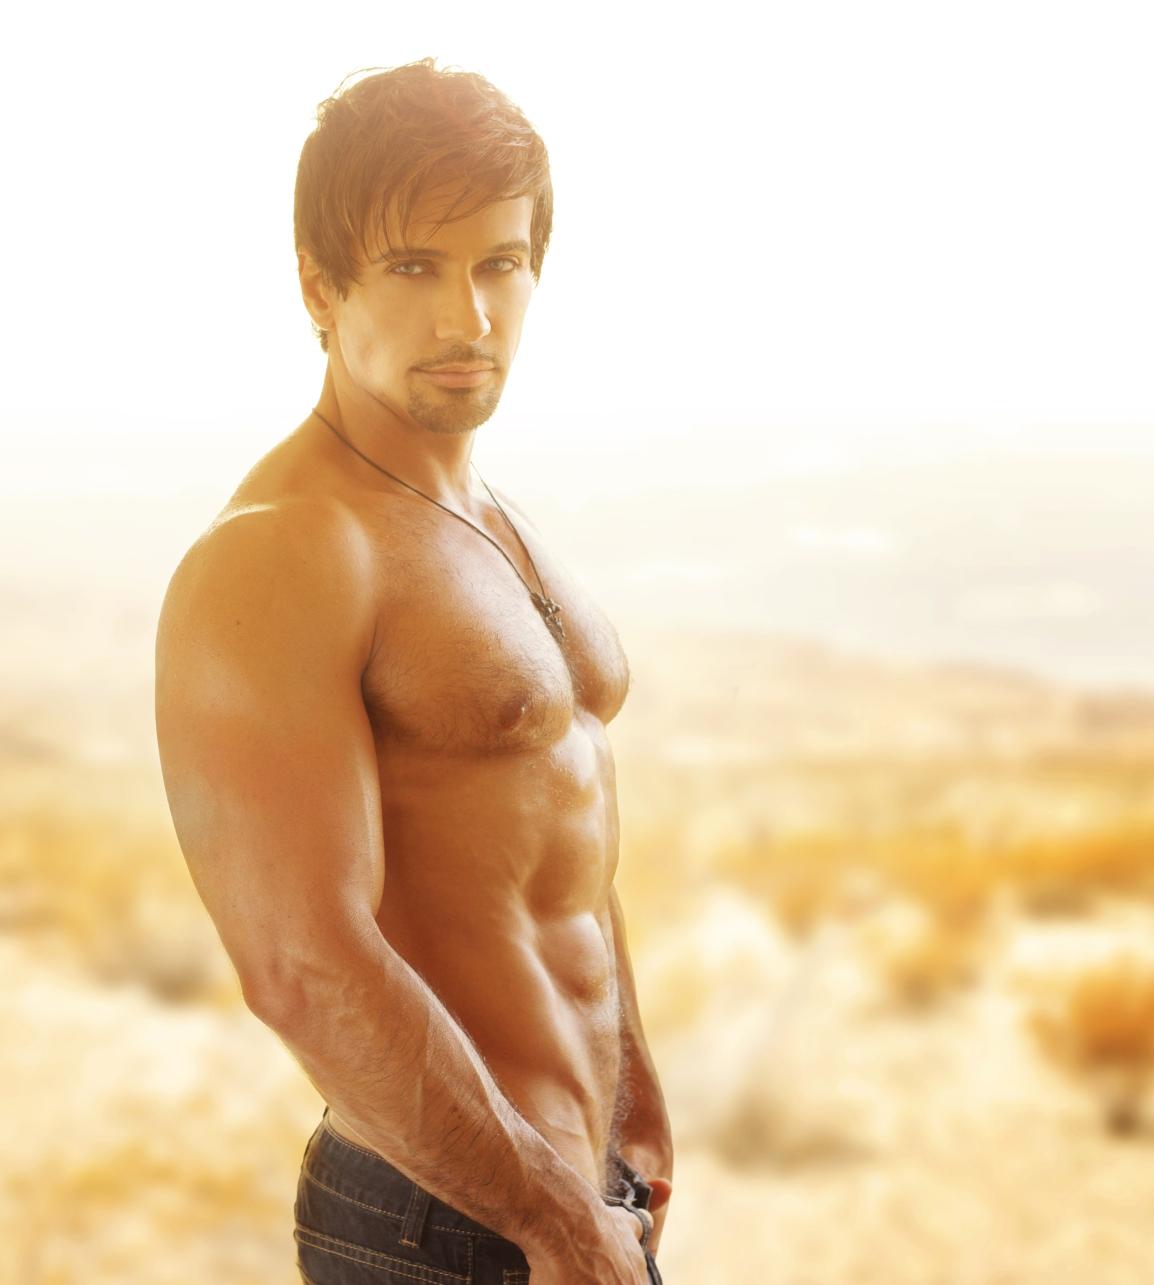 bigstock-Sexy-muscular-man-with-great-b-50886008